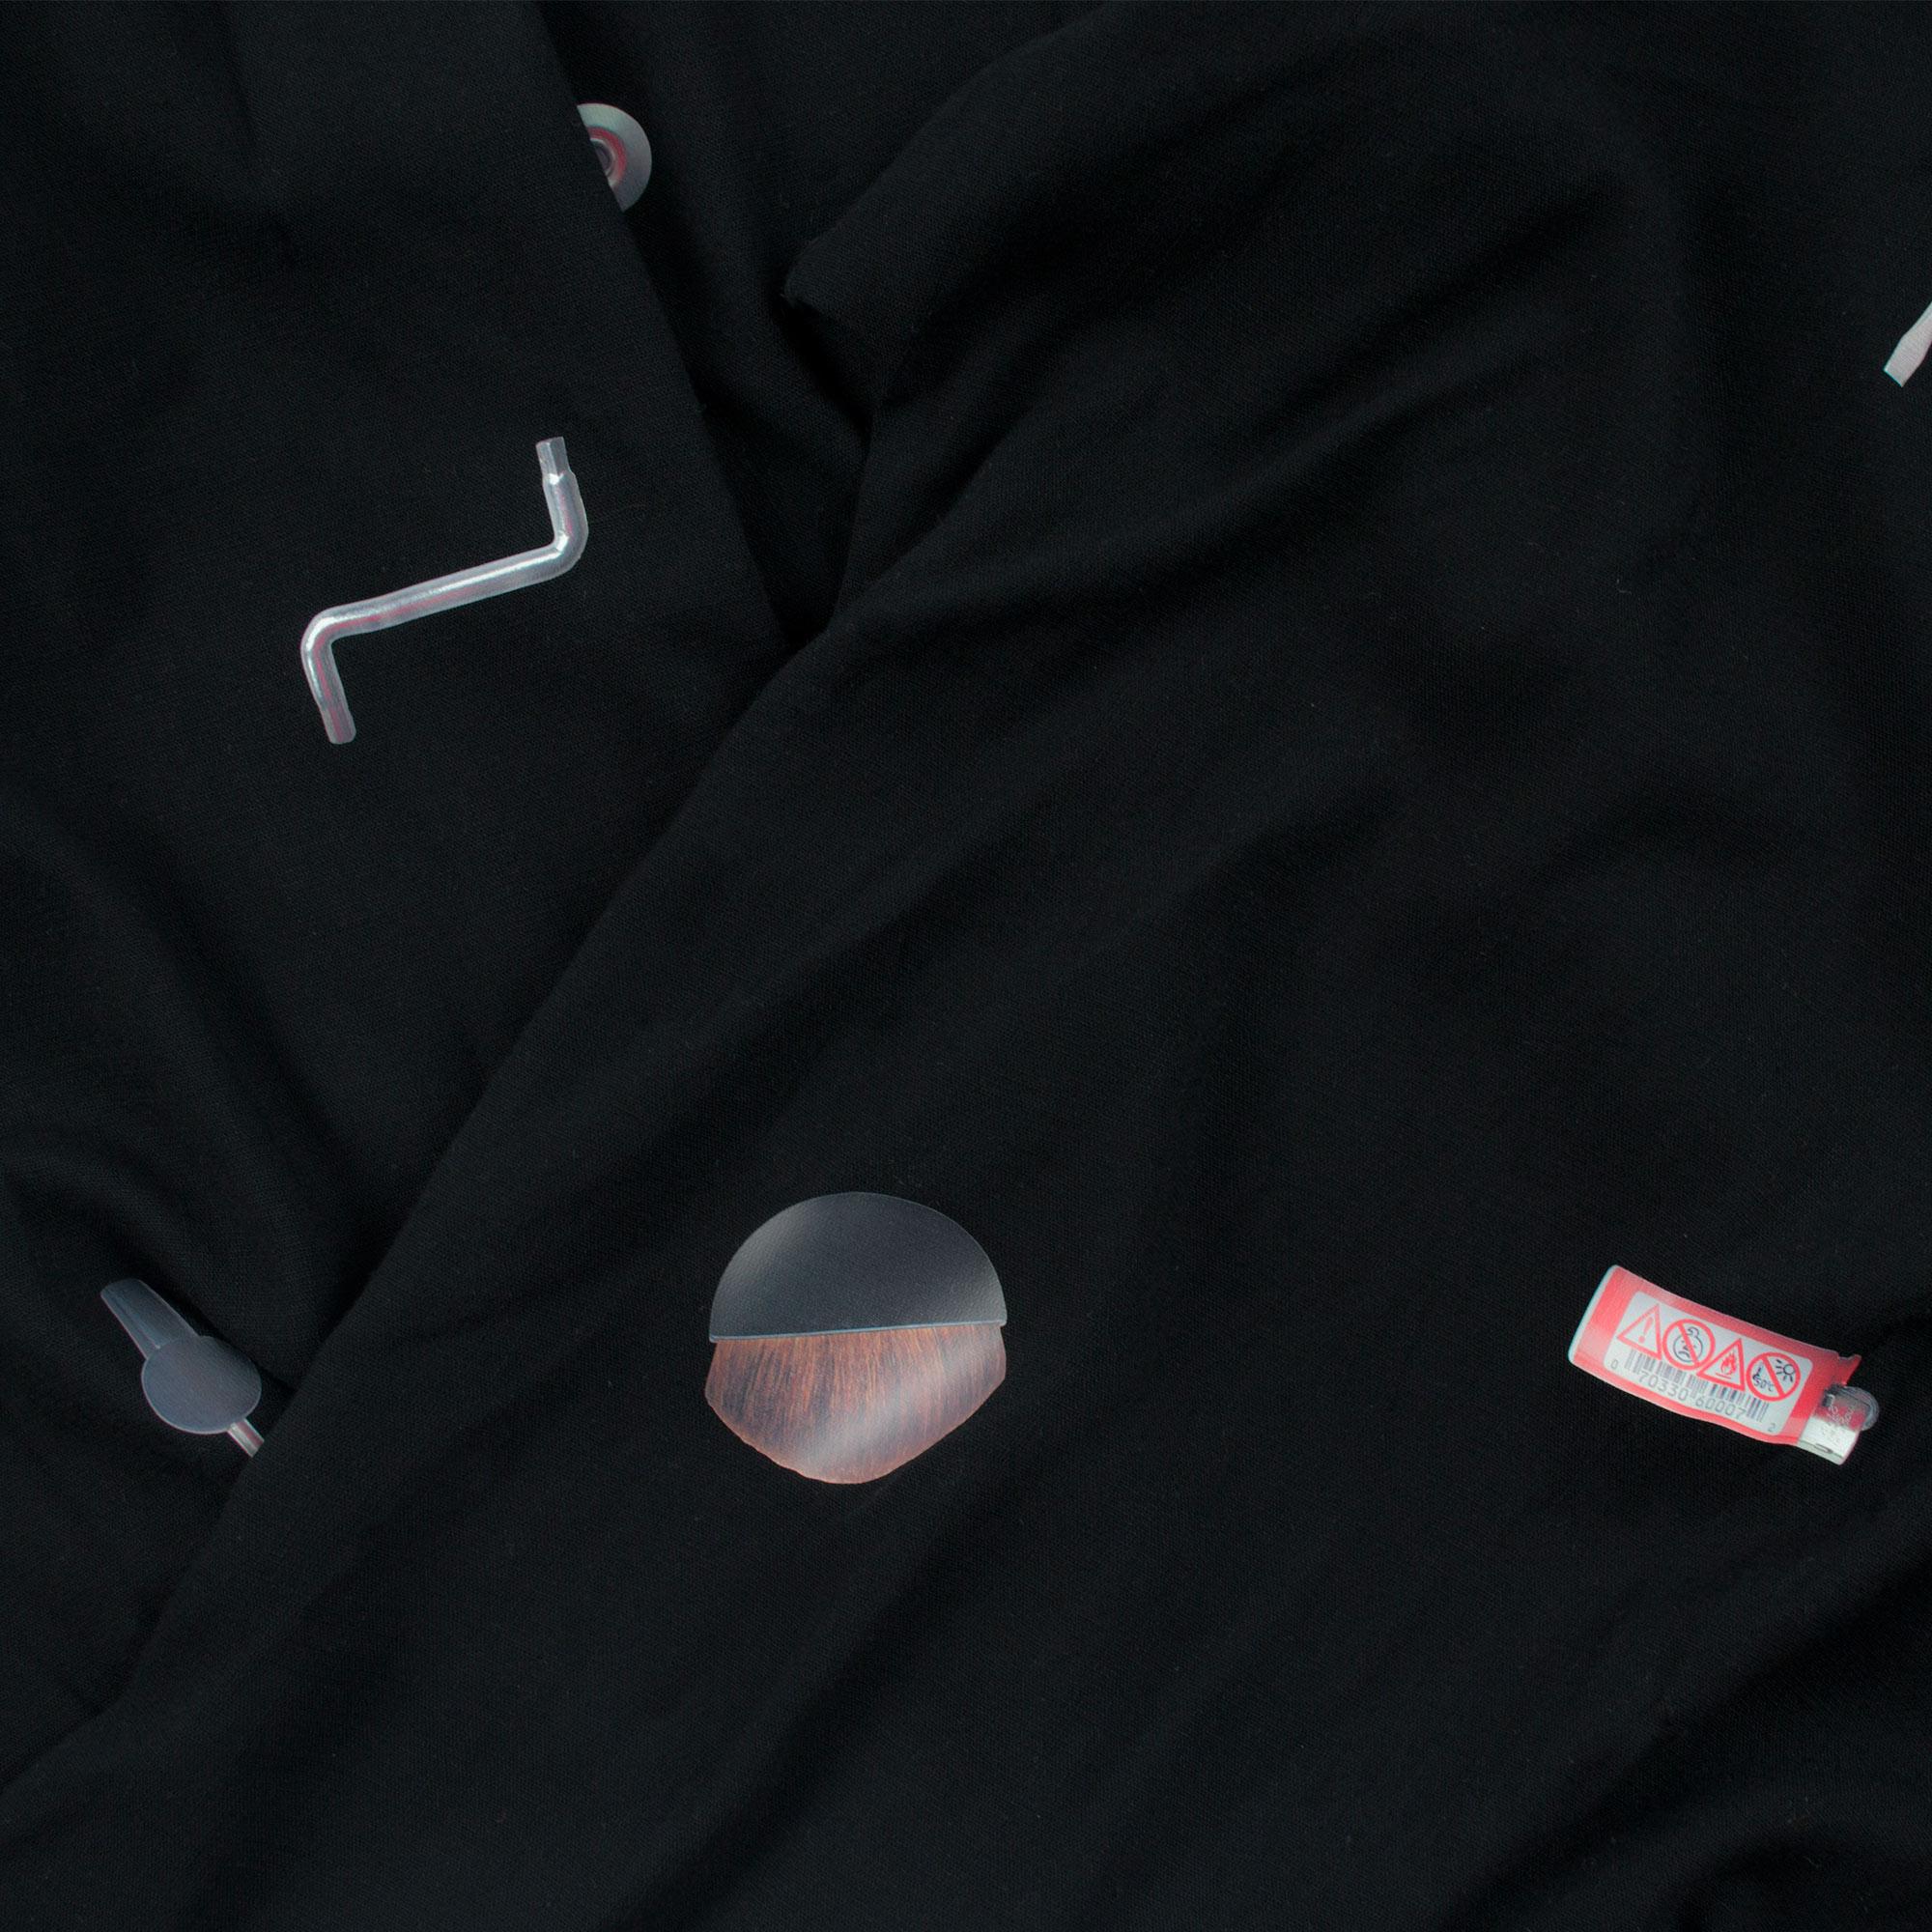 starstyling zoeppritz things kaftan, Farbe schwarz, Material Viskose in Groesse S